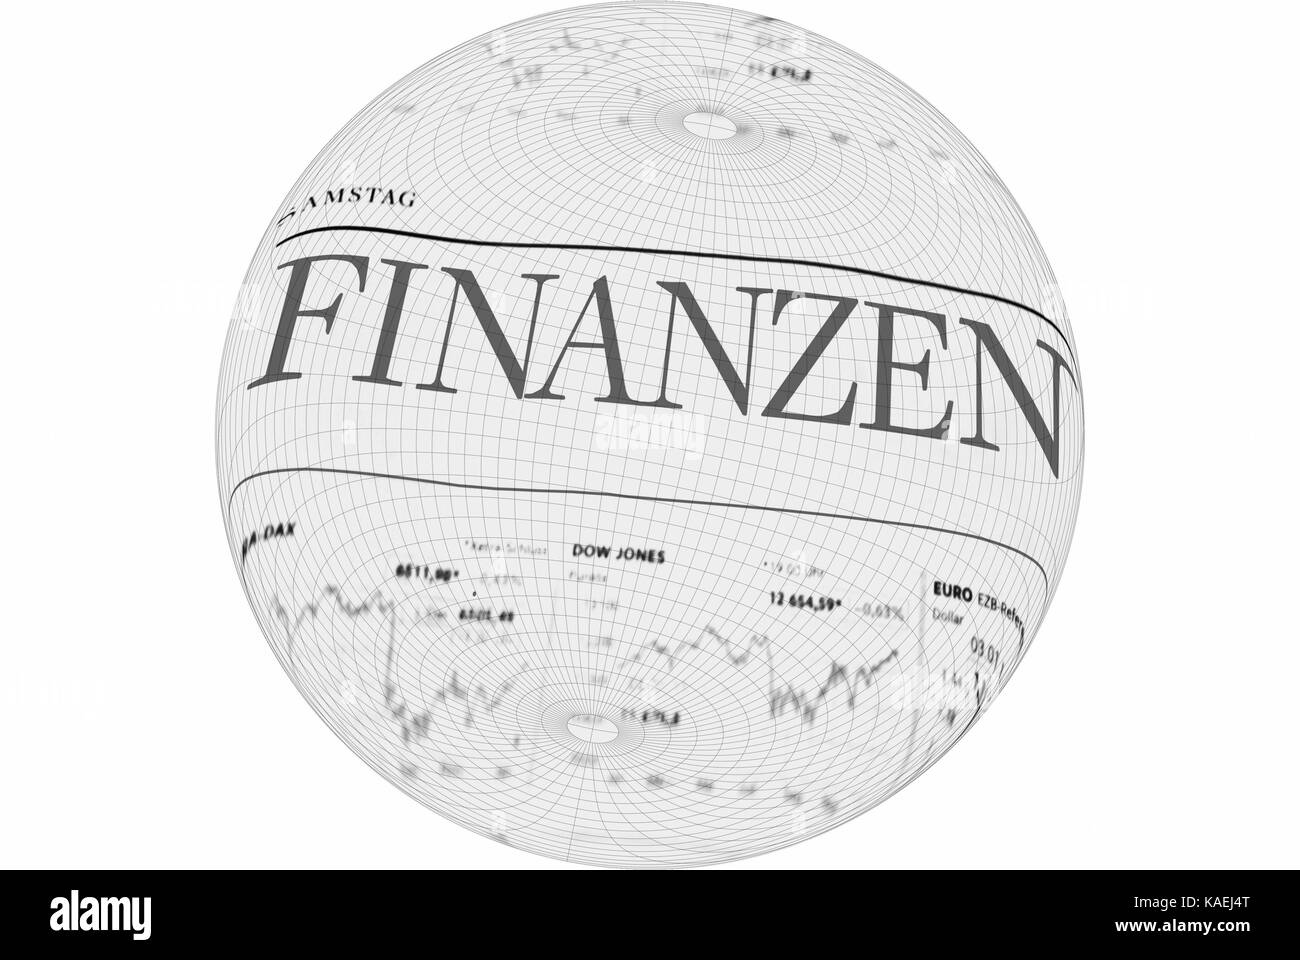 Finance - Stock Image